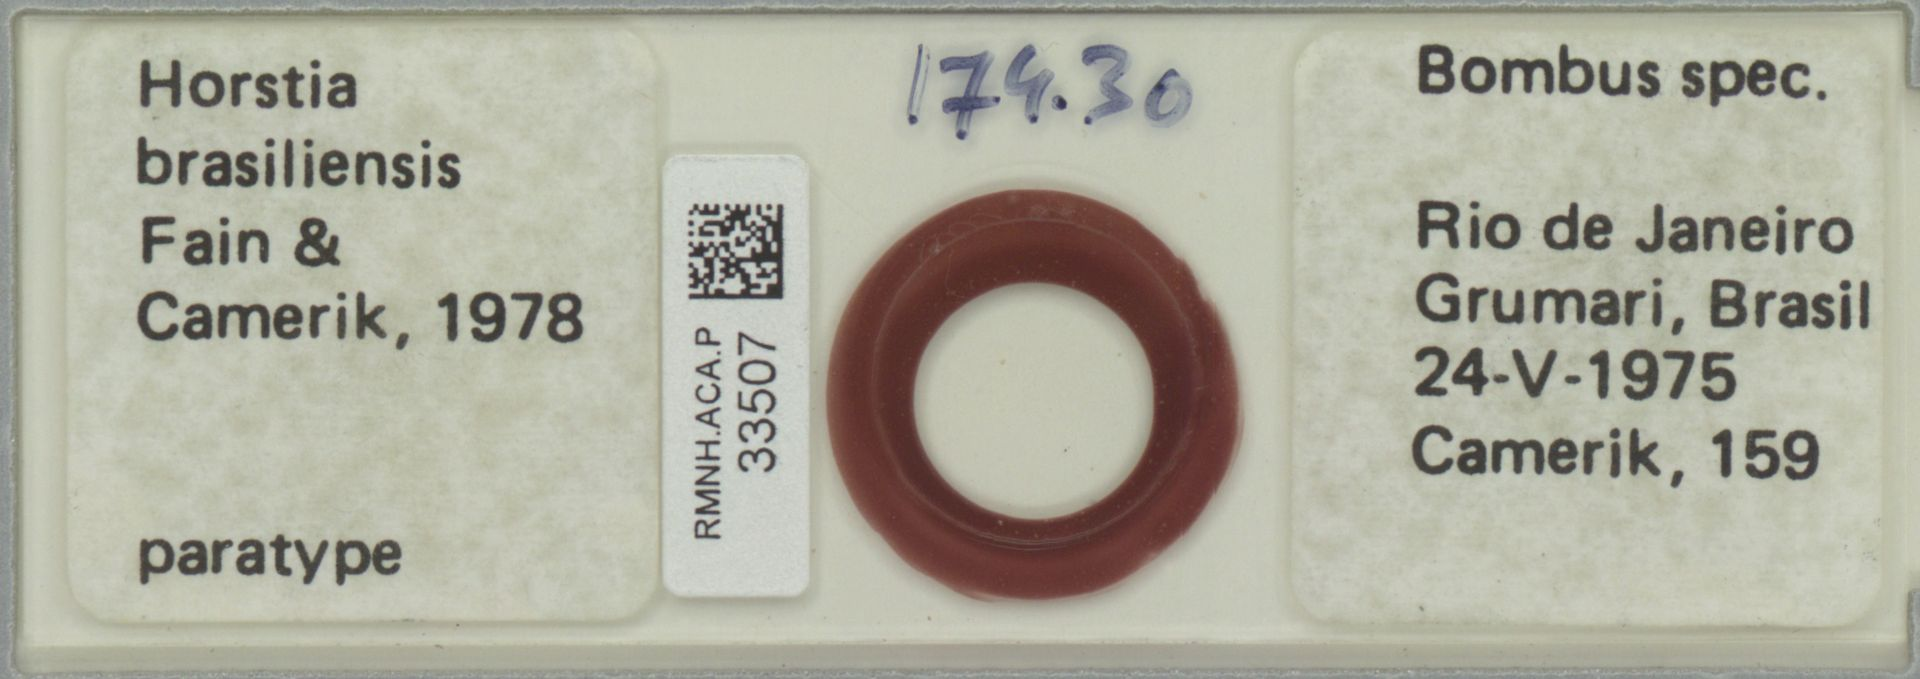 RMNH.ACA.P.33507 | Horstia brasiliensis Fain & Camerik 1978